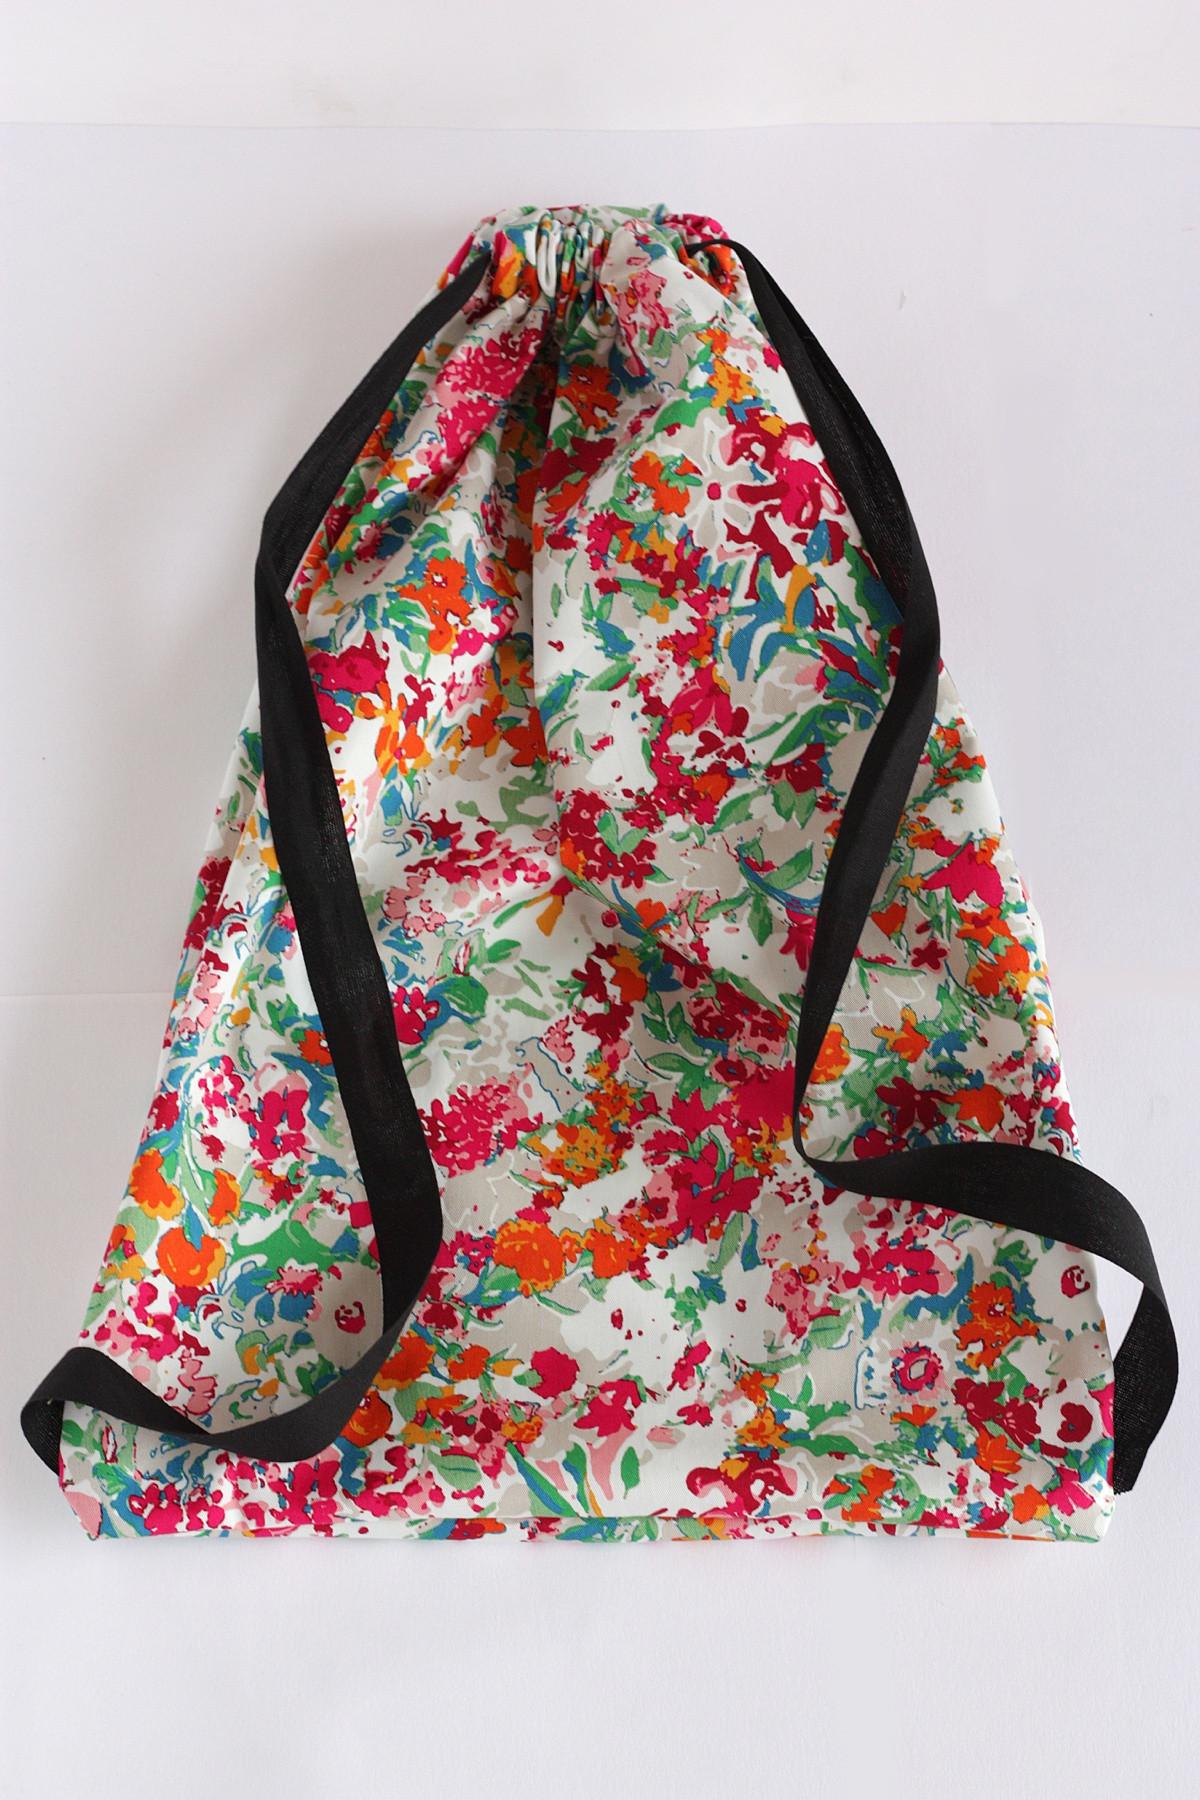 Diy Rucksack  DIY Drawstring Backpack